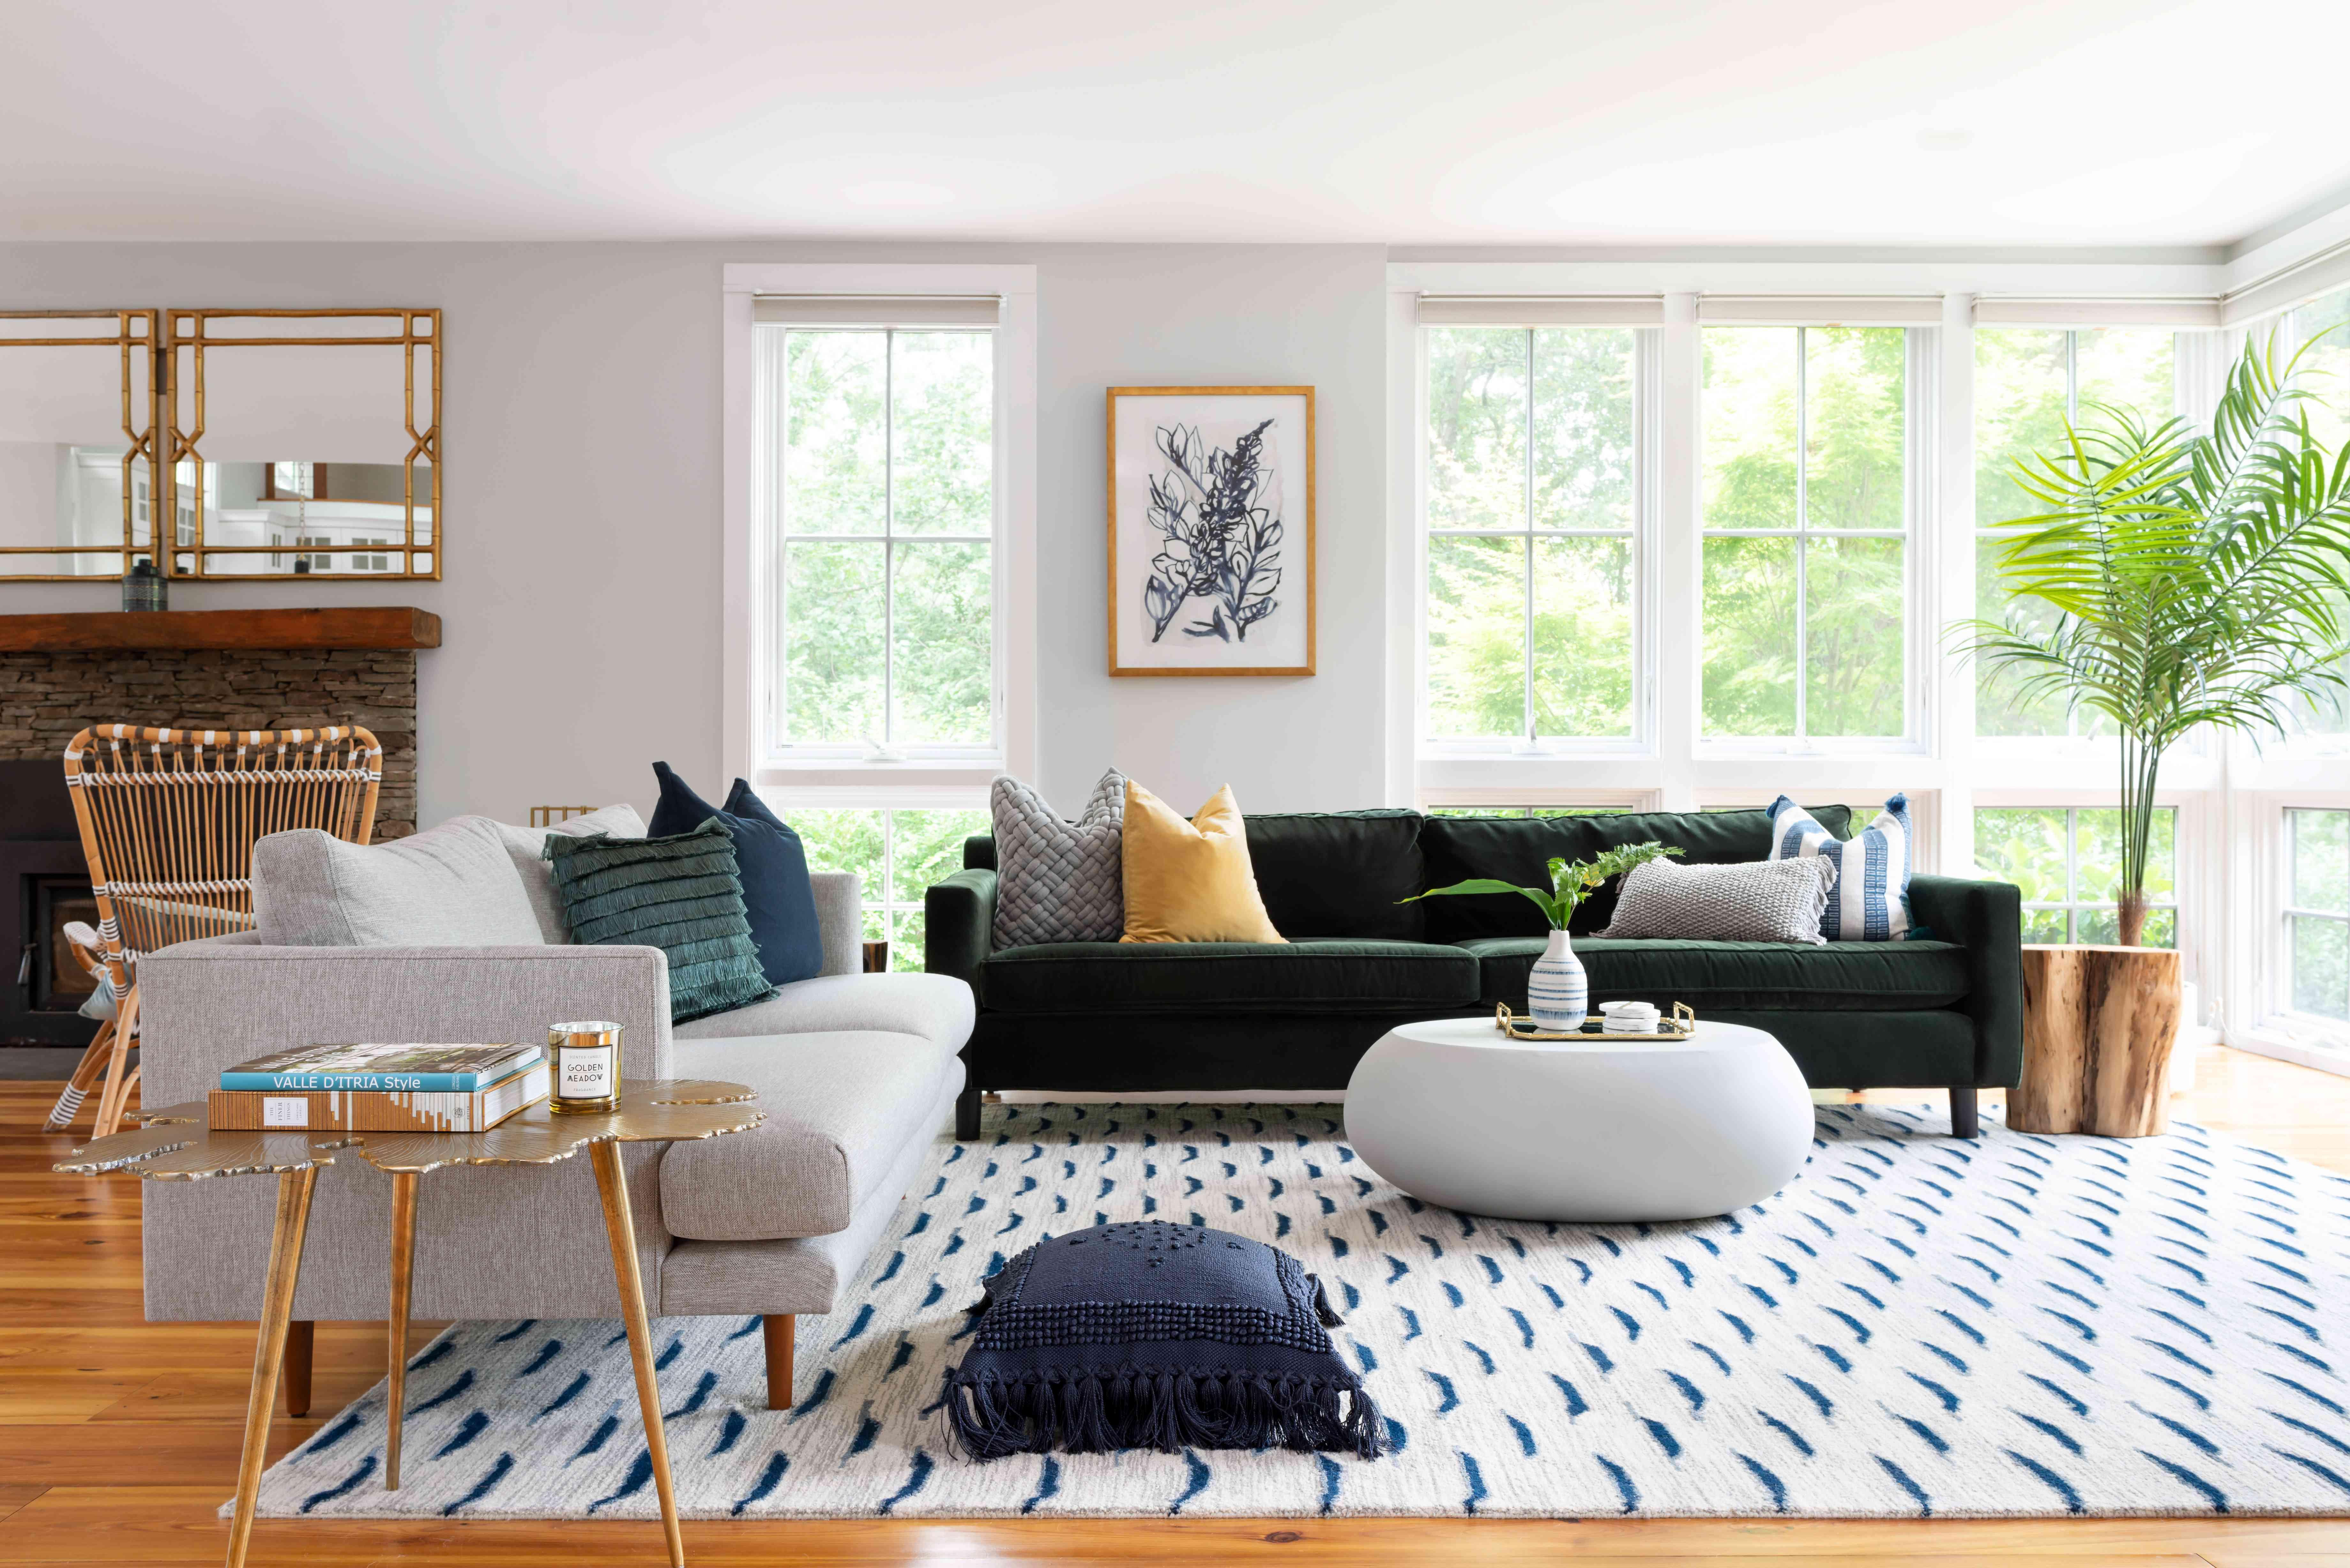 Gray and light living room